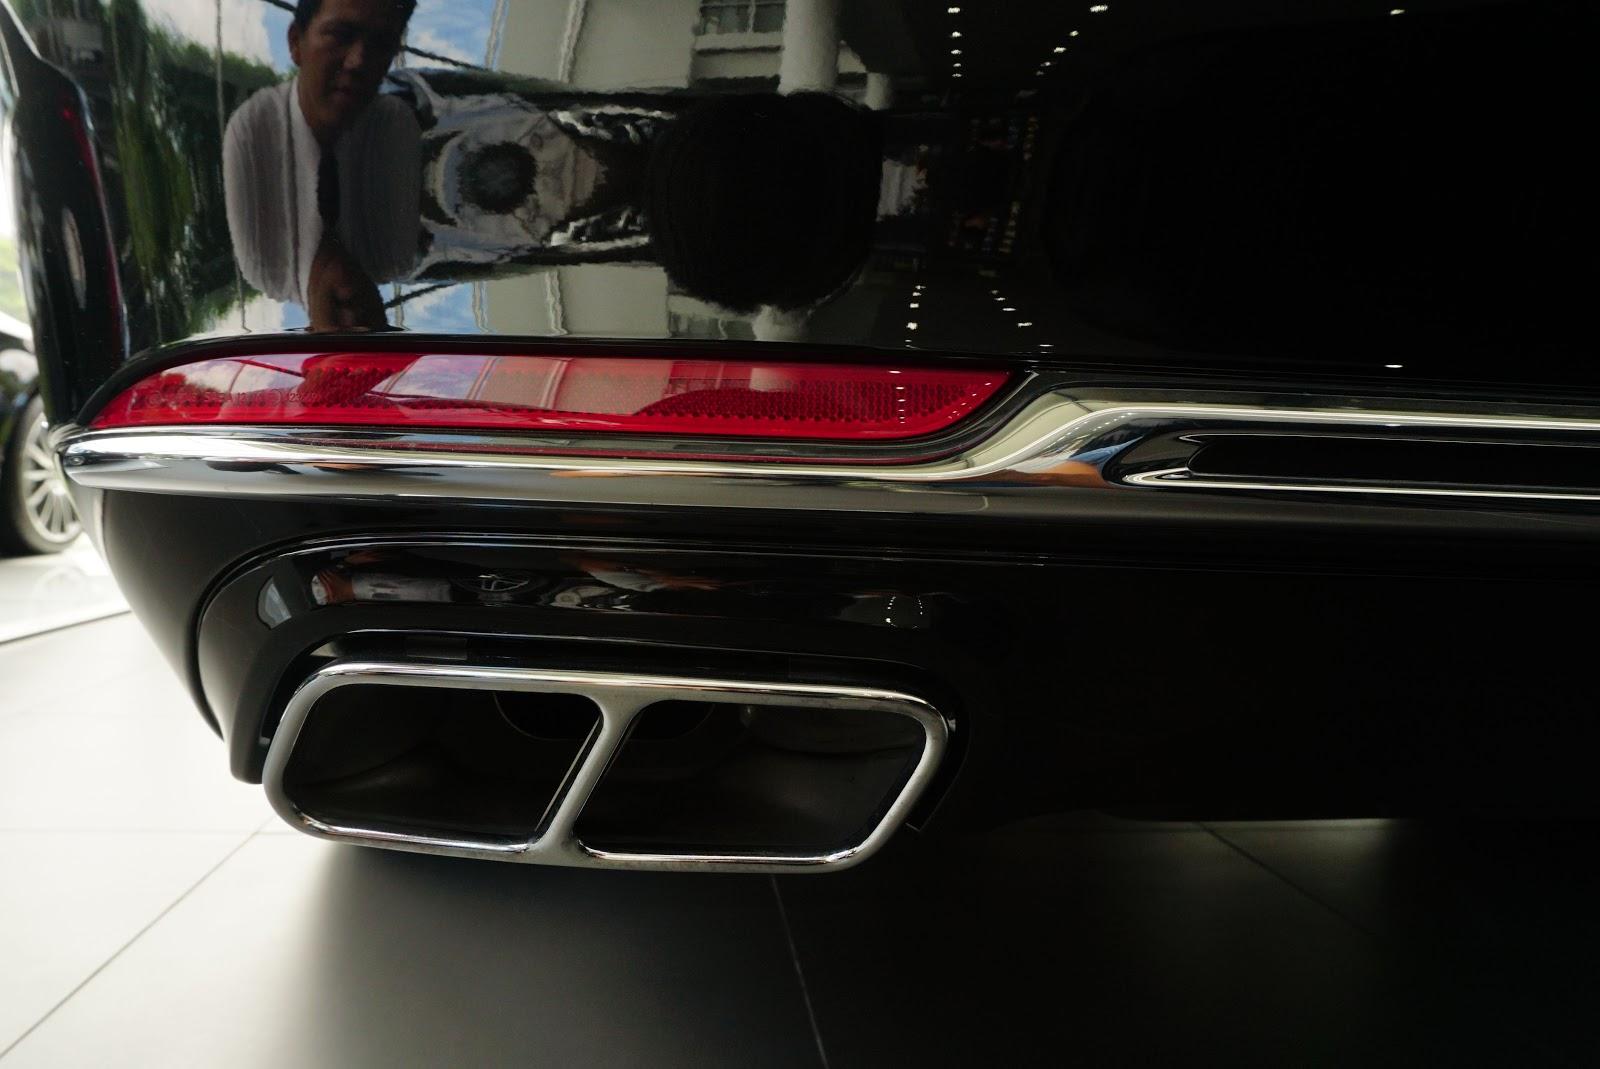 Ngoại Thất Xe Mercedes Benz S600 MAYBACH Màu Đen a05